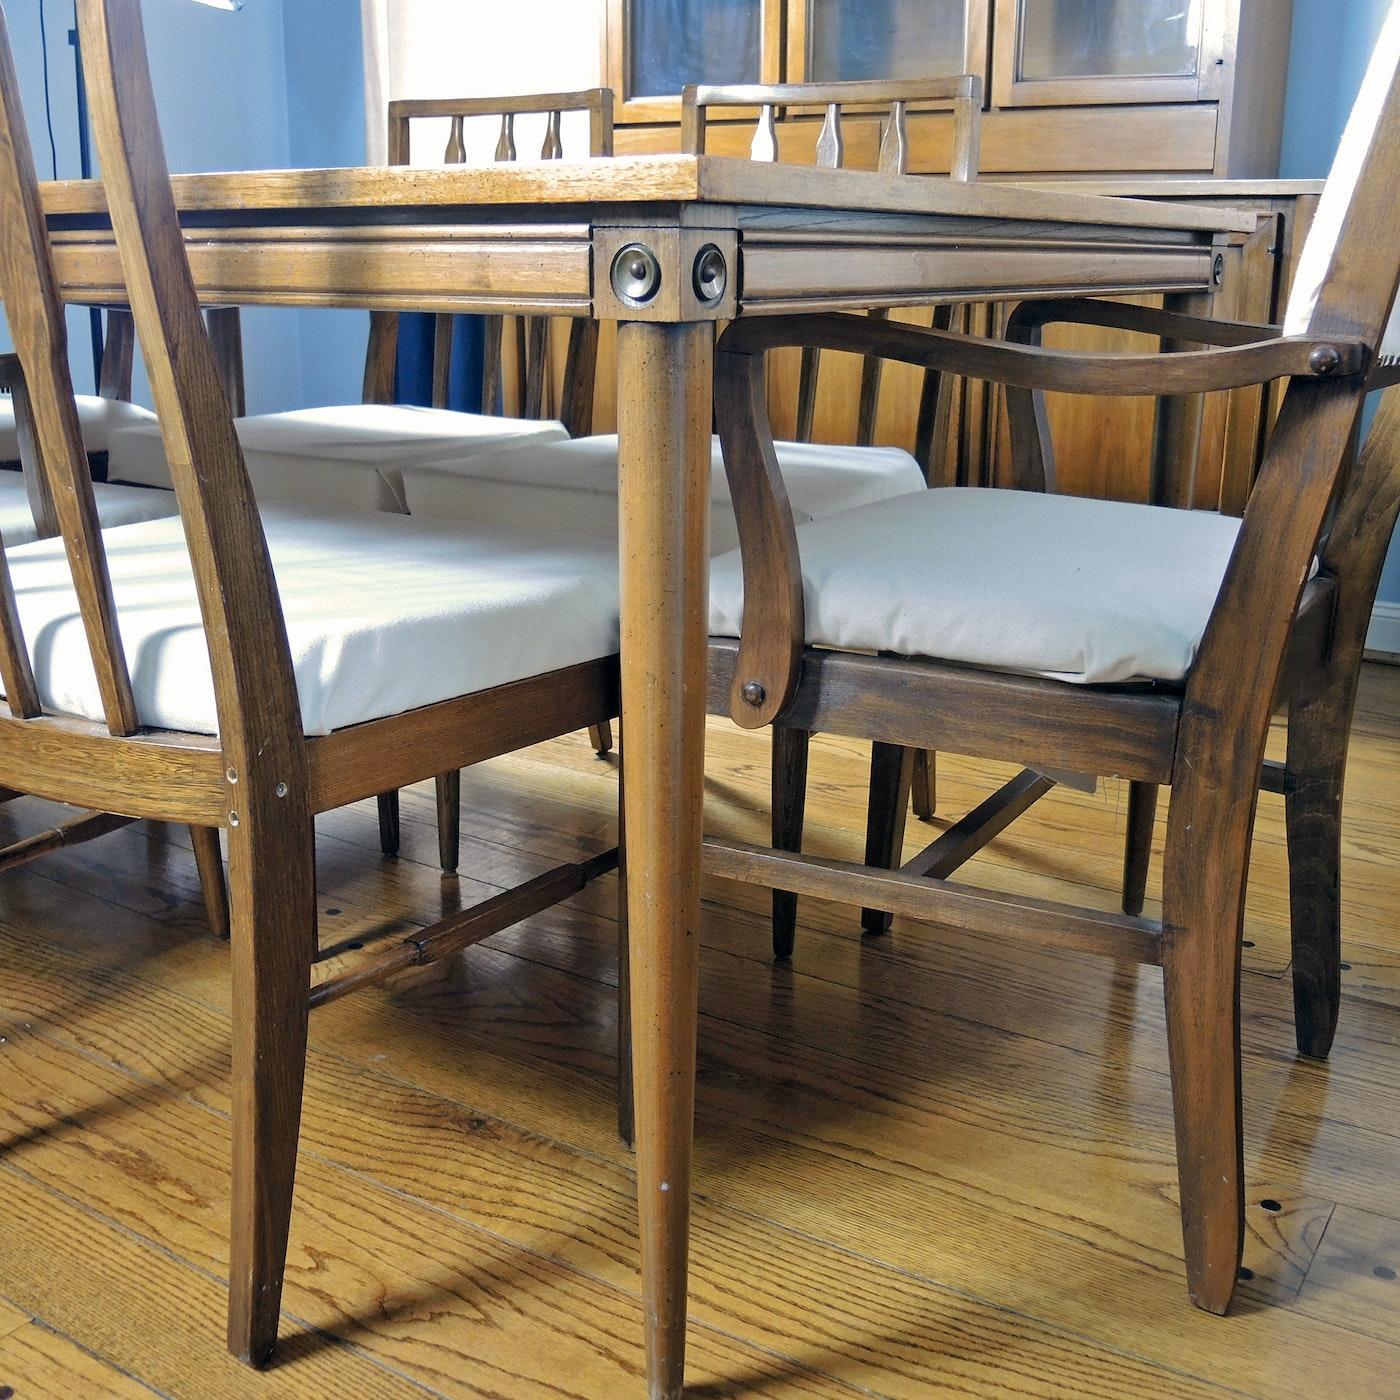 Vintage Basic-Witz Mid-Century Modern Dining Room Set and ...